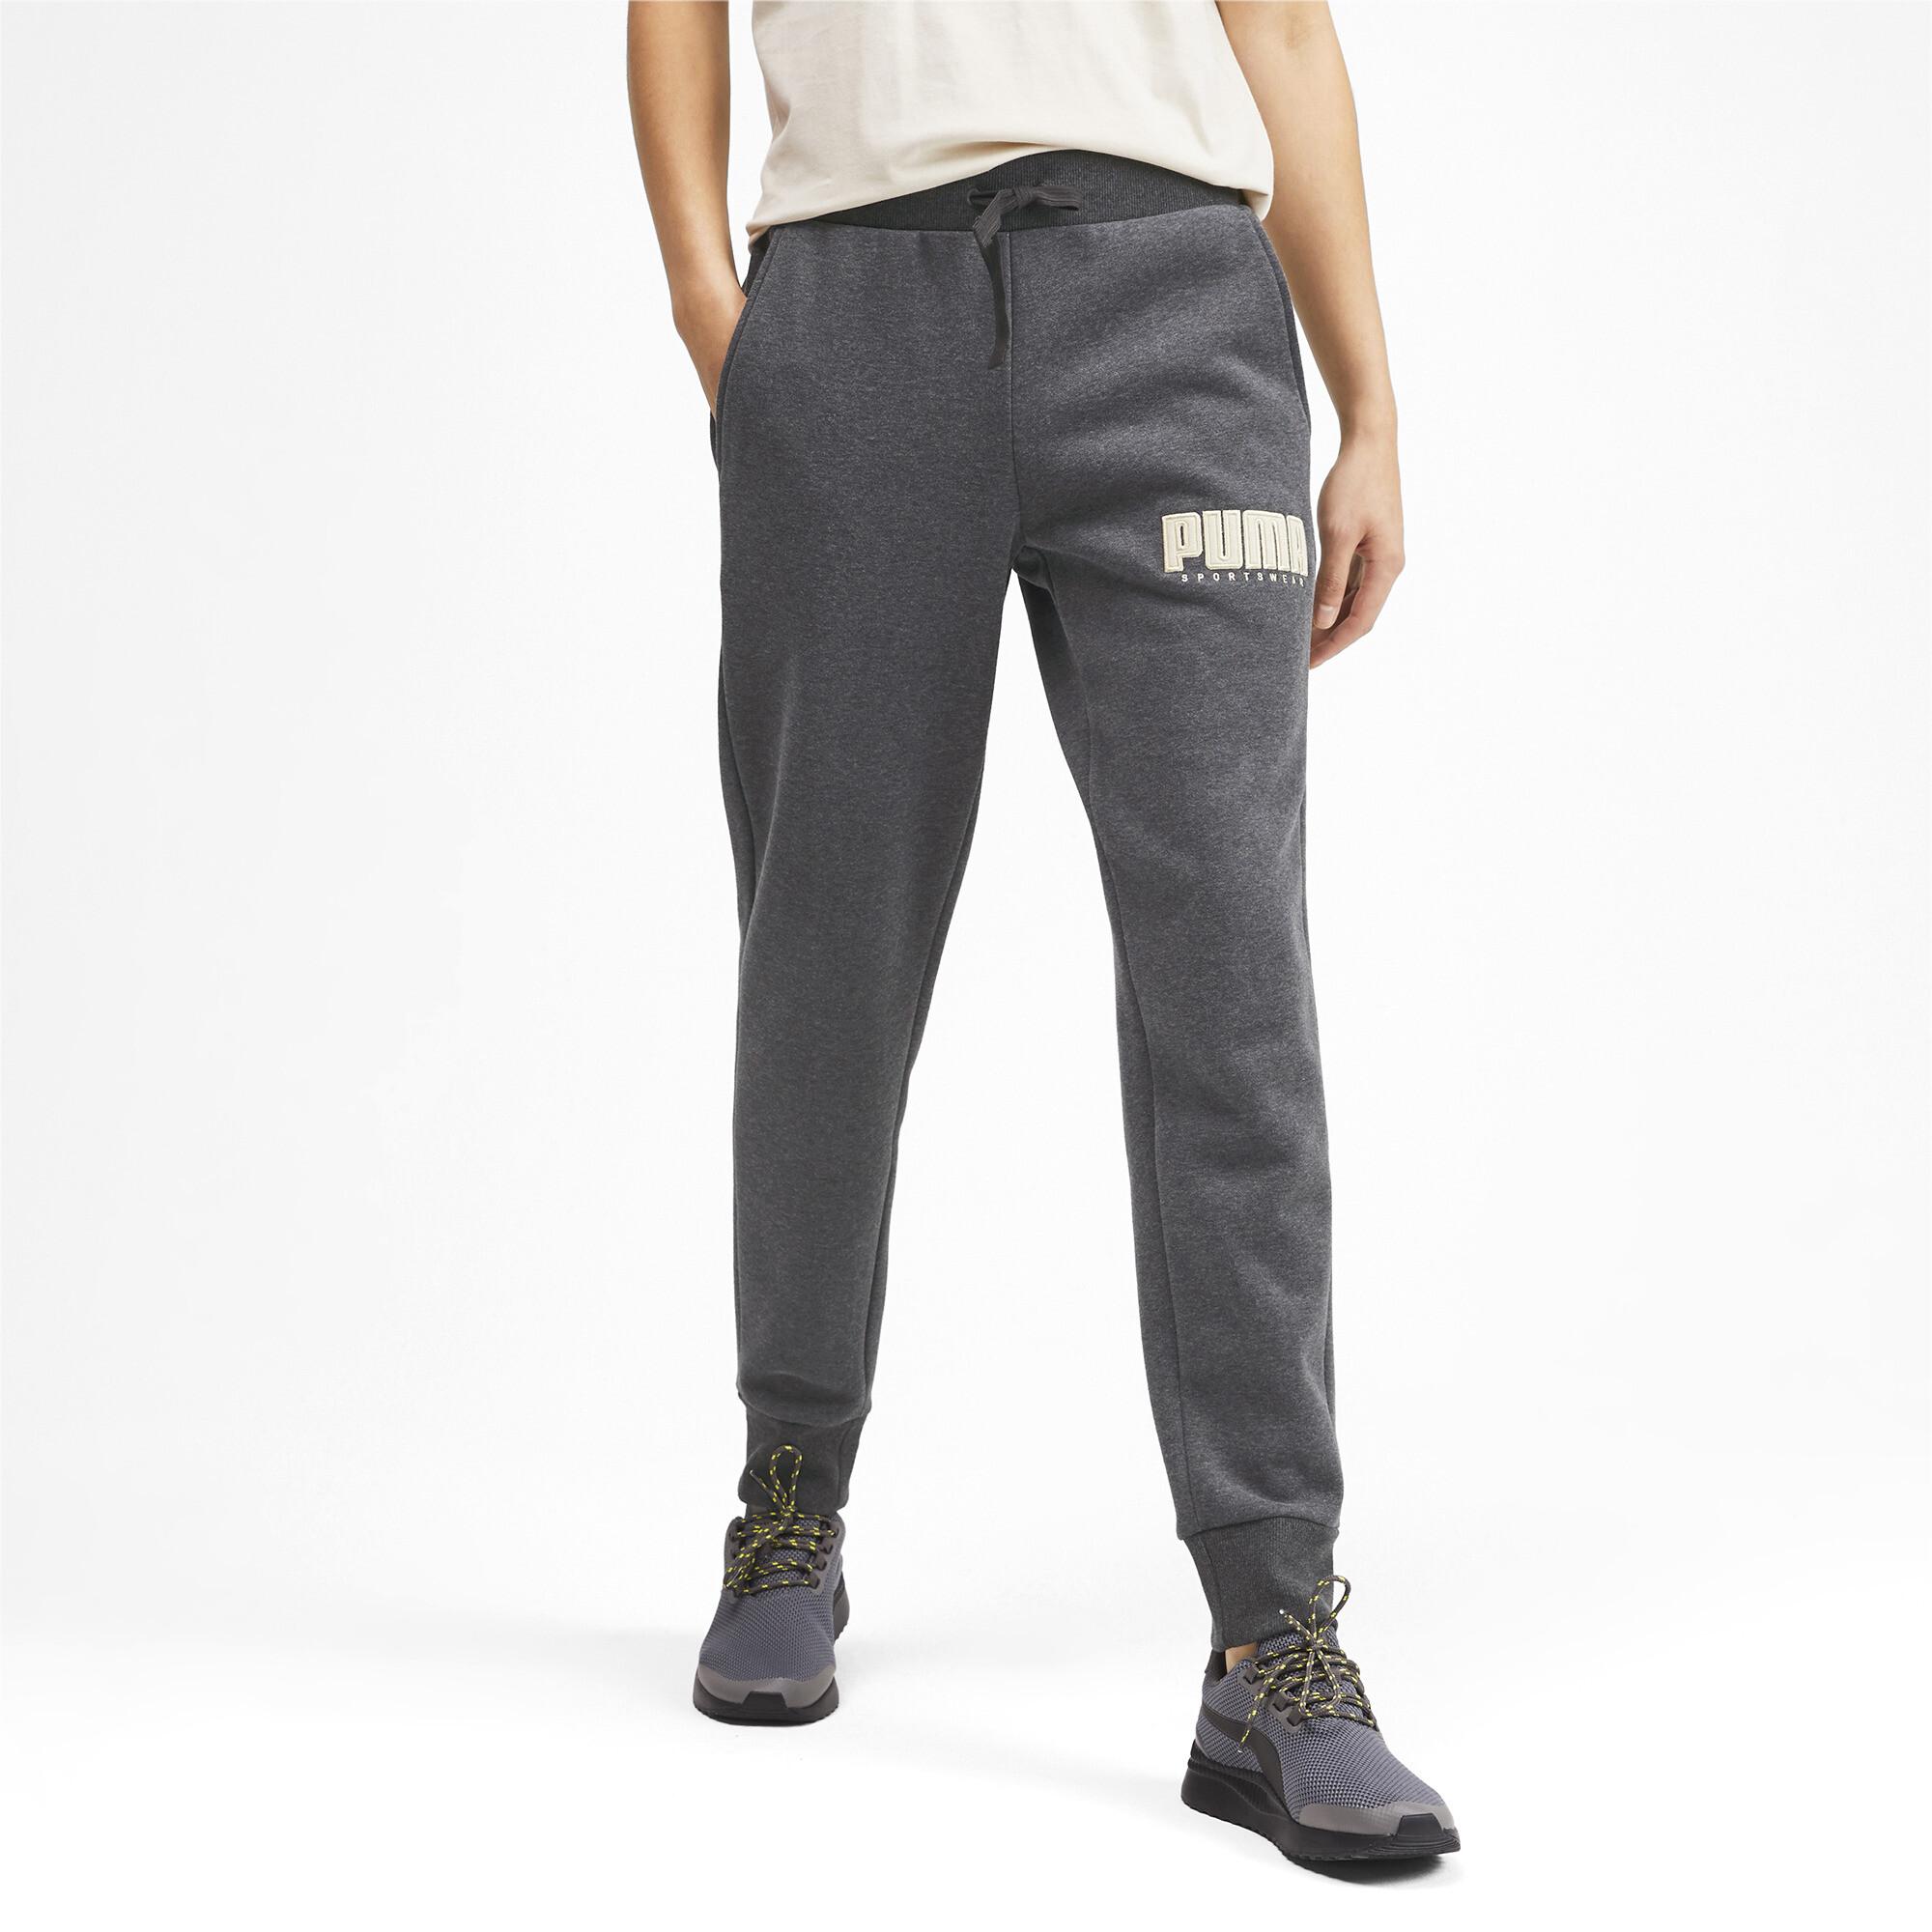 PUMA-Athletics-Men-039-s-Fleece-Pants-Men-Knitted-Pants-Basics thumbnail 4